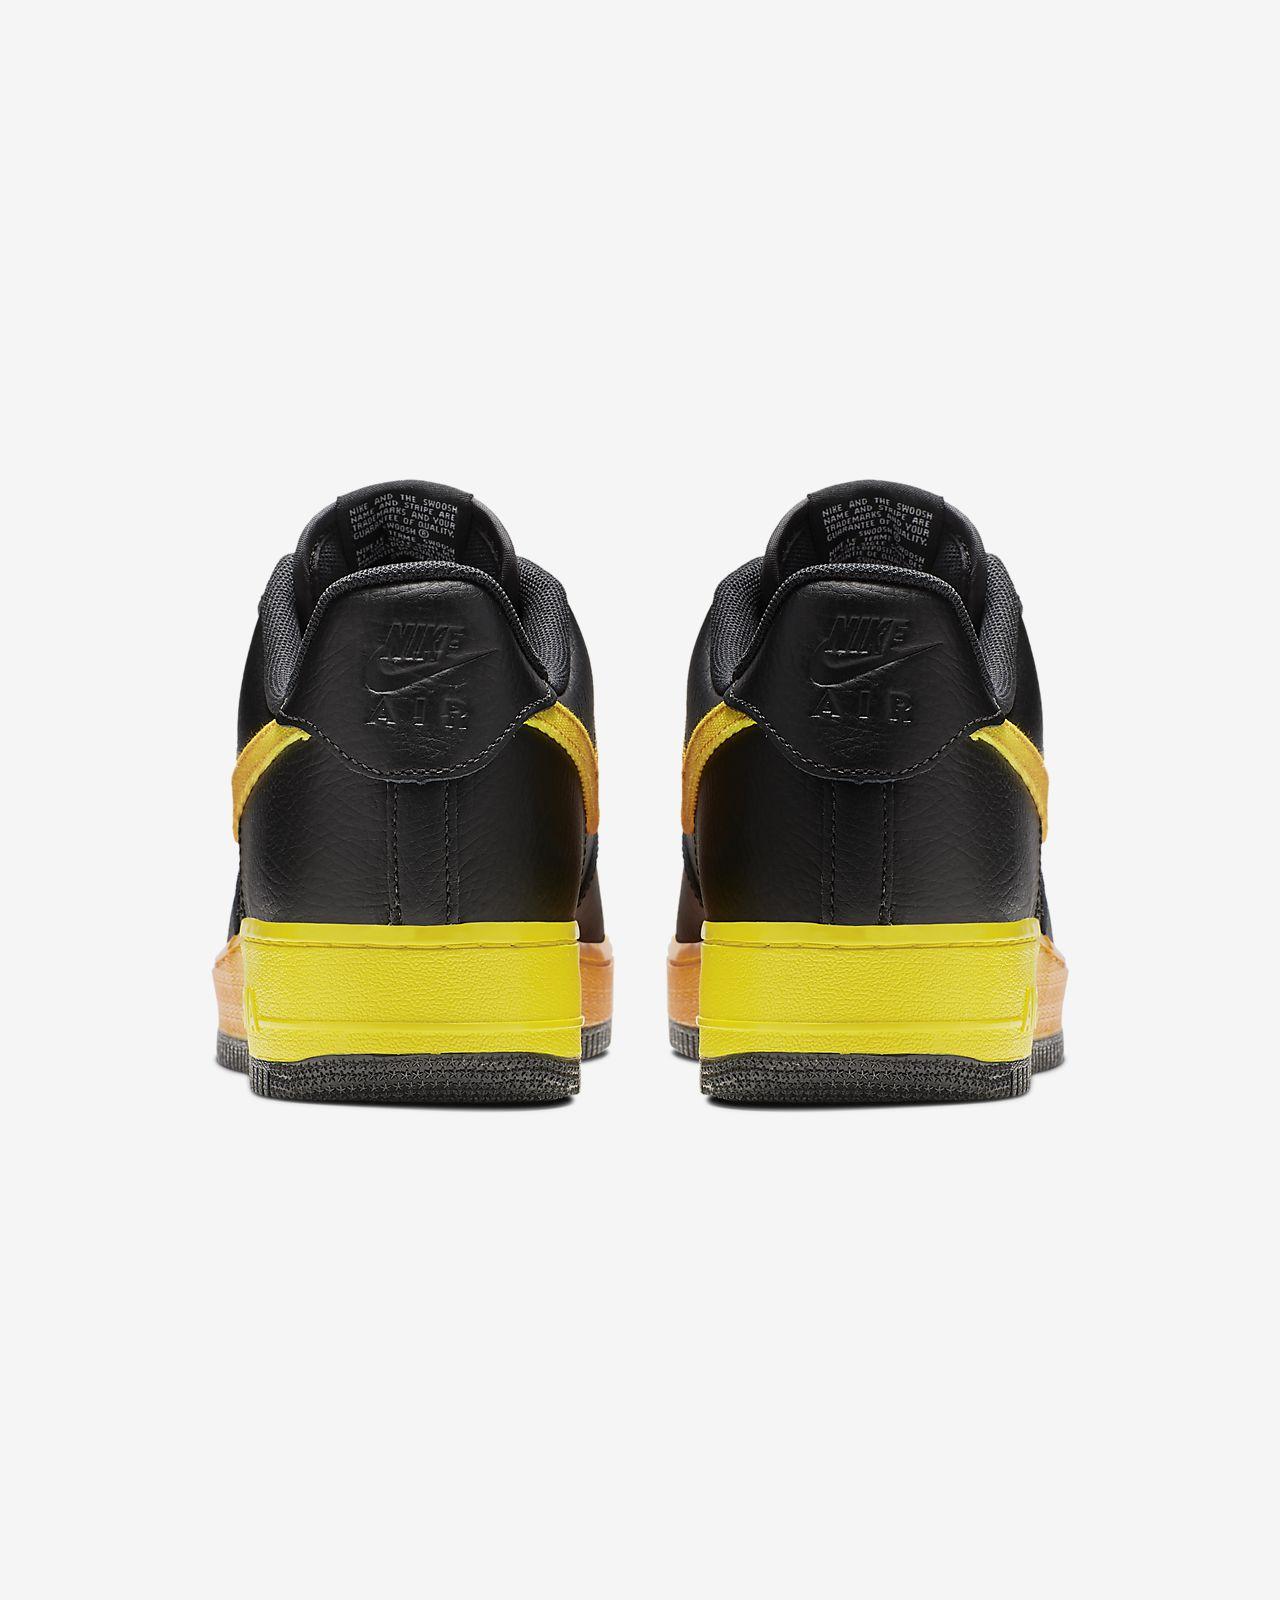 '07 Men's Shoe Force 1 Lv8 Nike Air kX8nOw0P